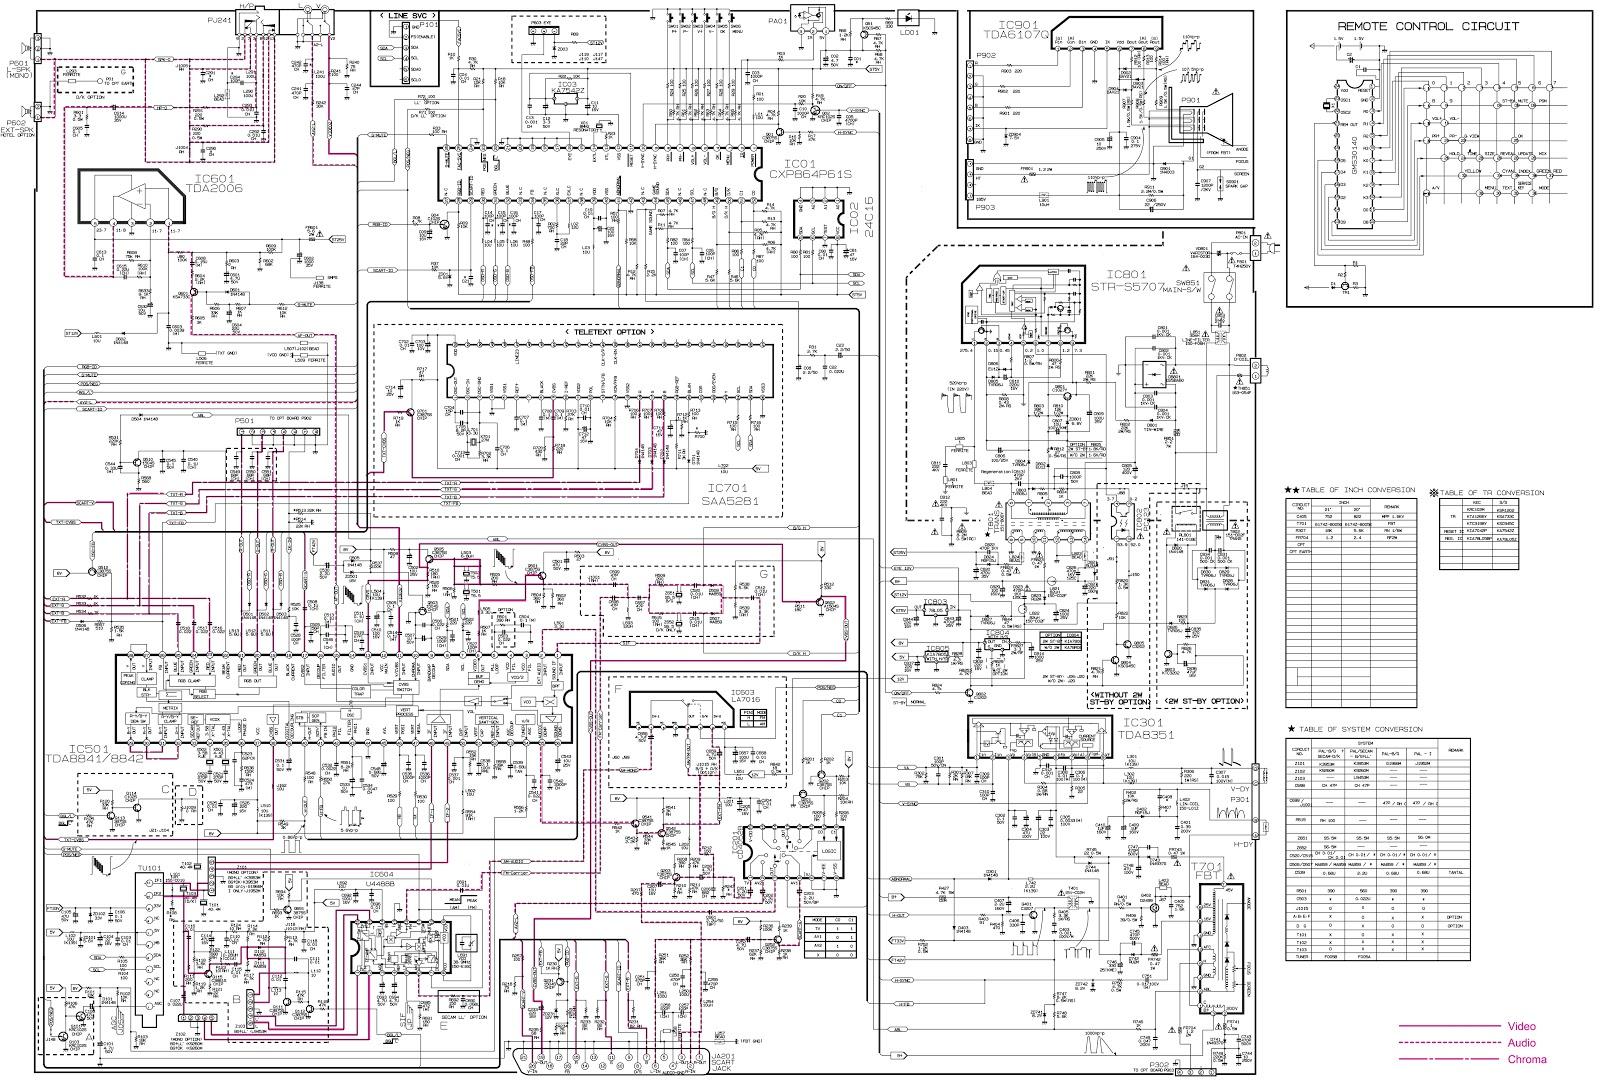 Wiring Diagram For Ckhkc Delay Timer 8 Pin